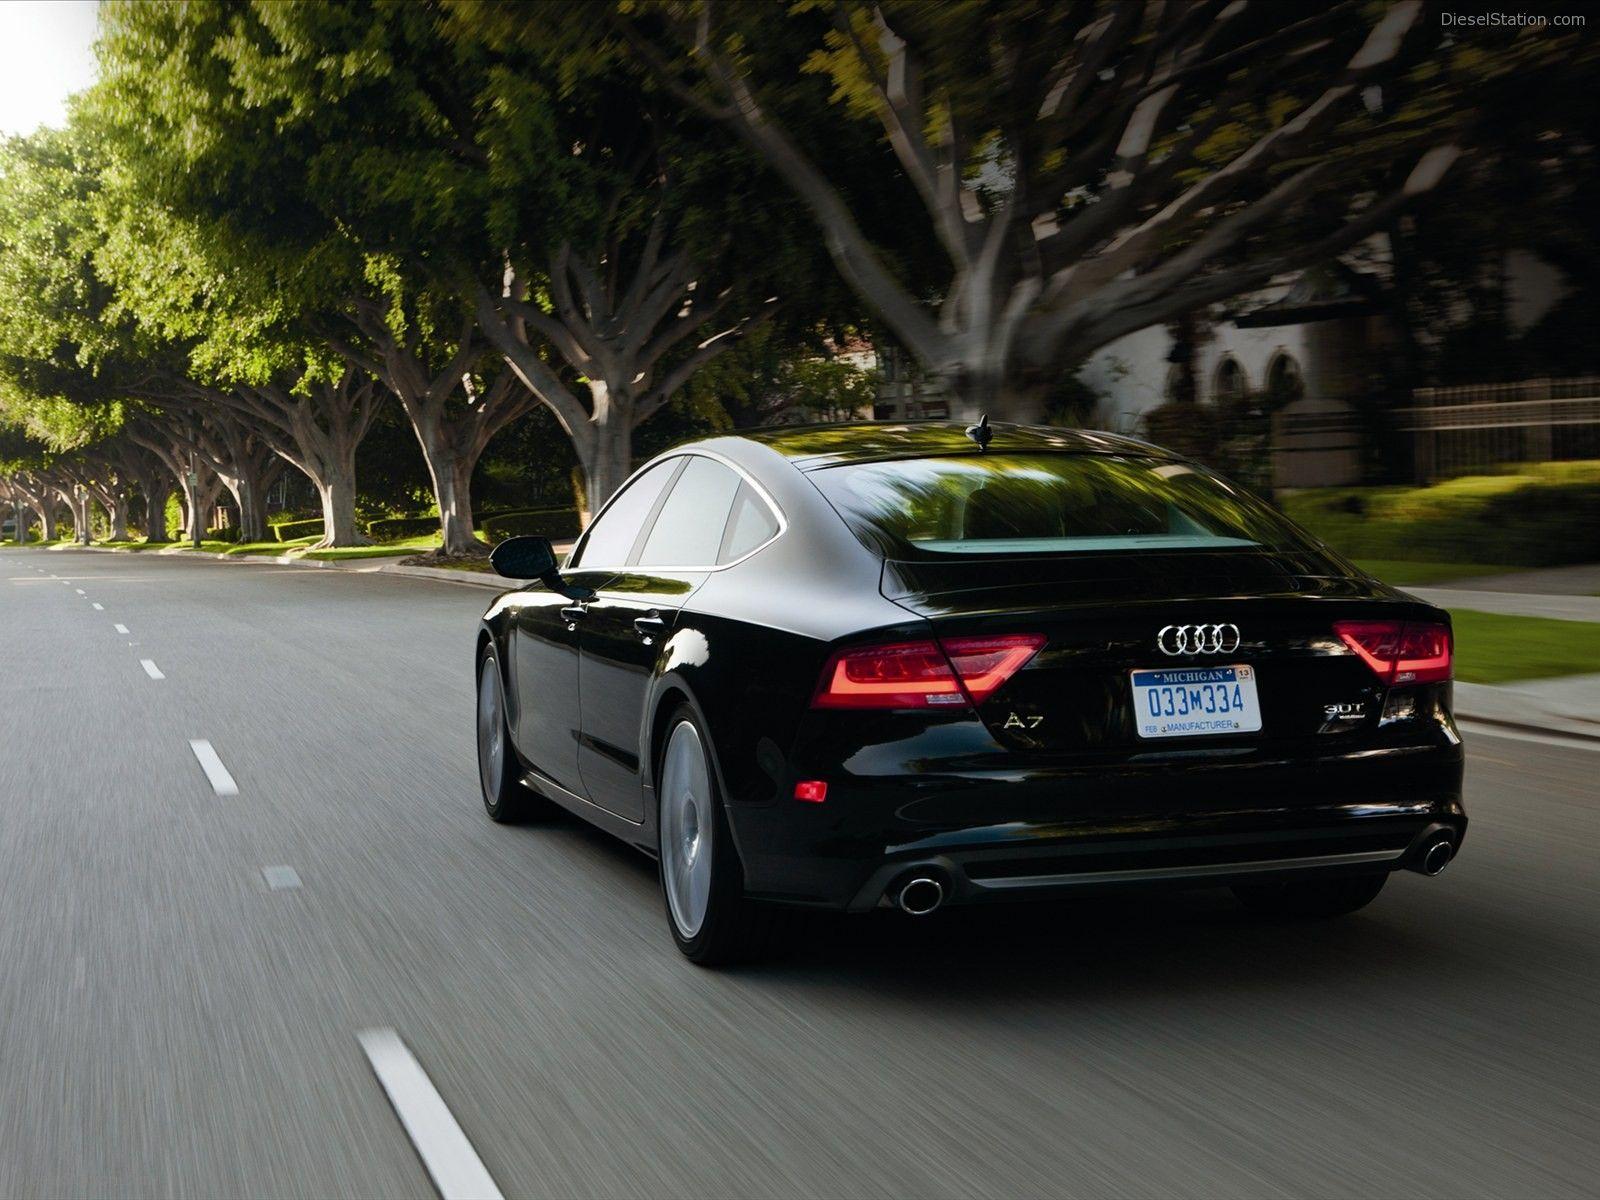 Amazing Crni Audi A7 Wallpaper Hd Pozadine Wallpaper Pinterest